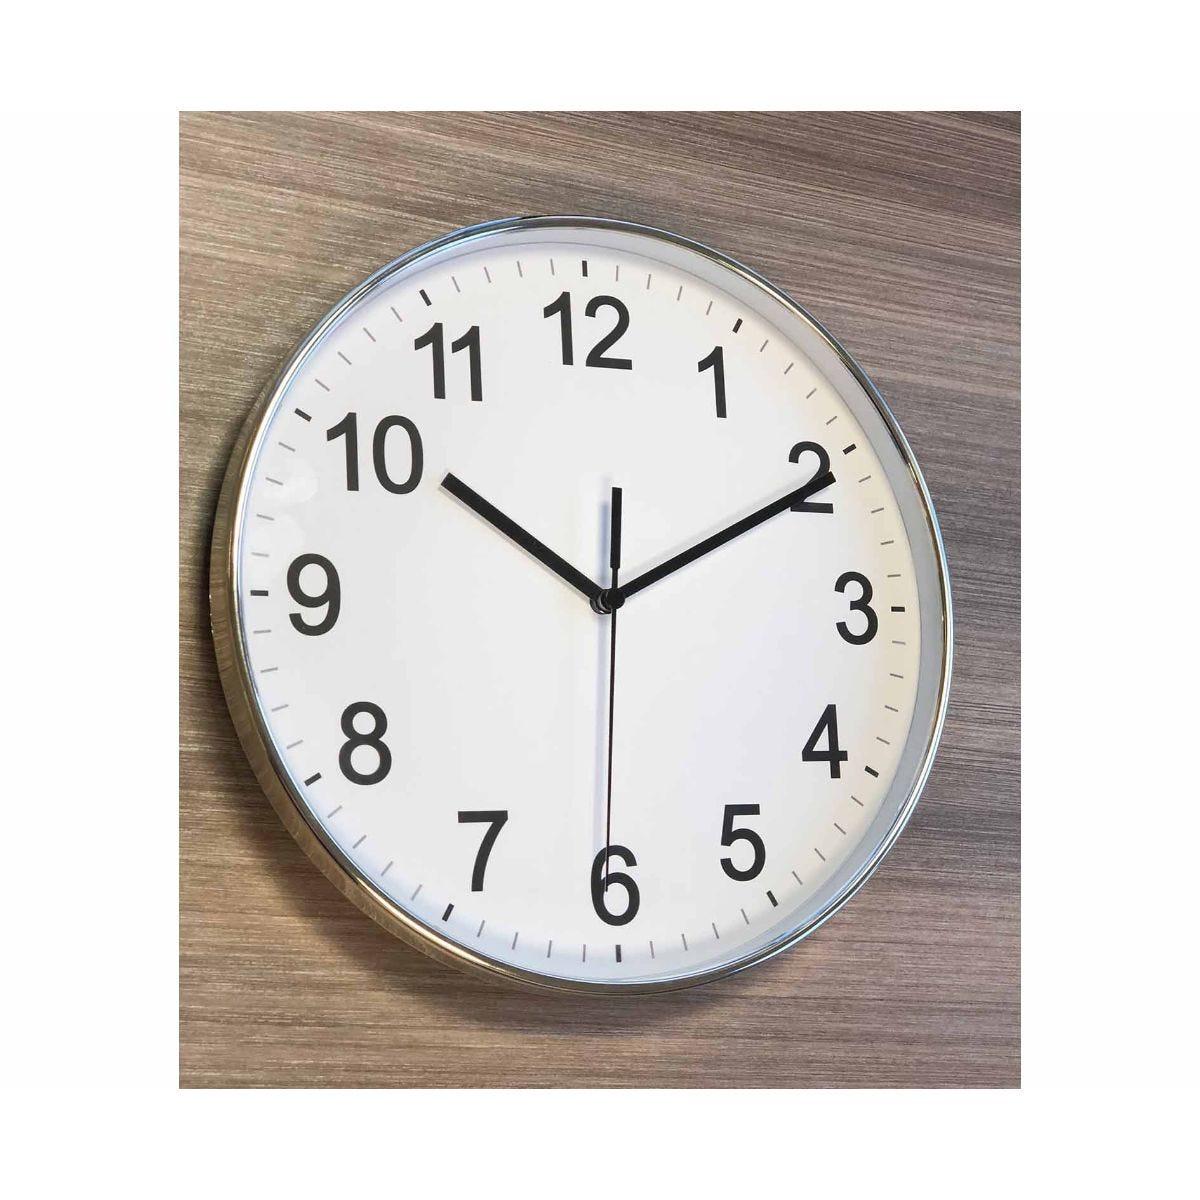 Image of Acctim Crewe Wall Clock